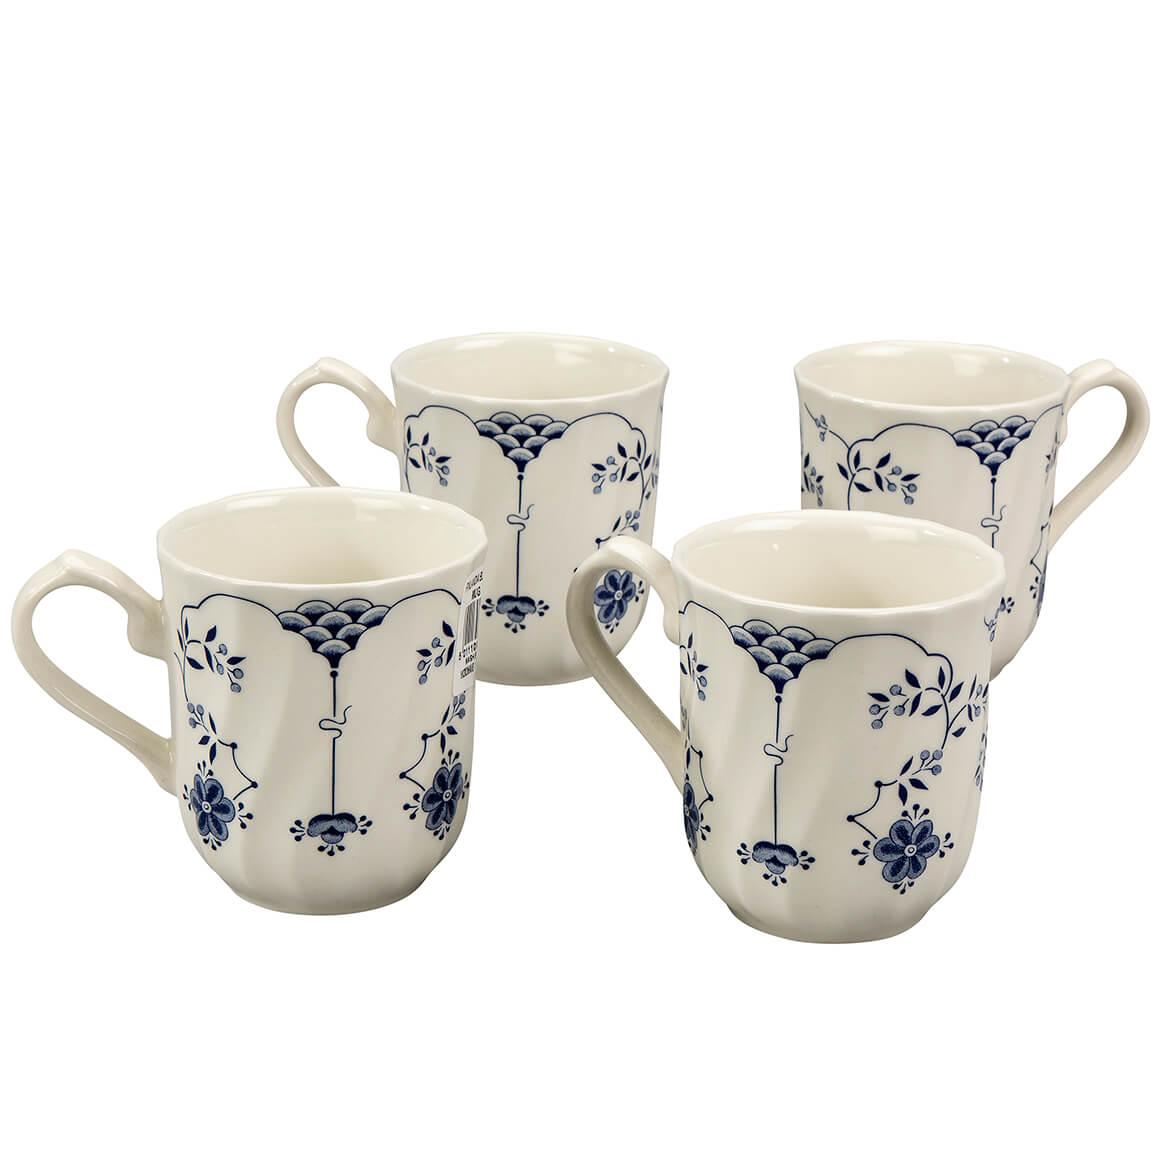 Finlandia Set of 4 Mugs-368562